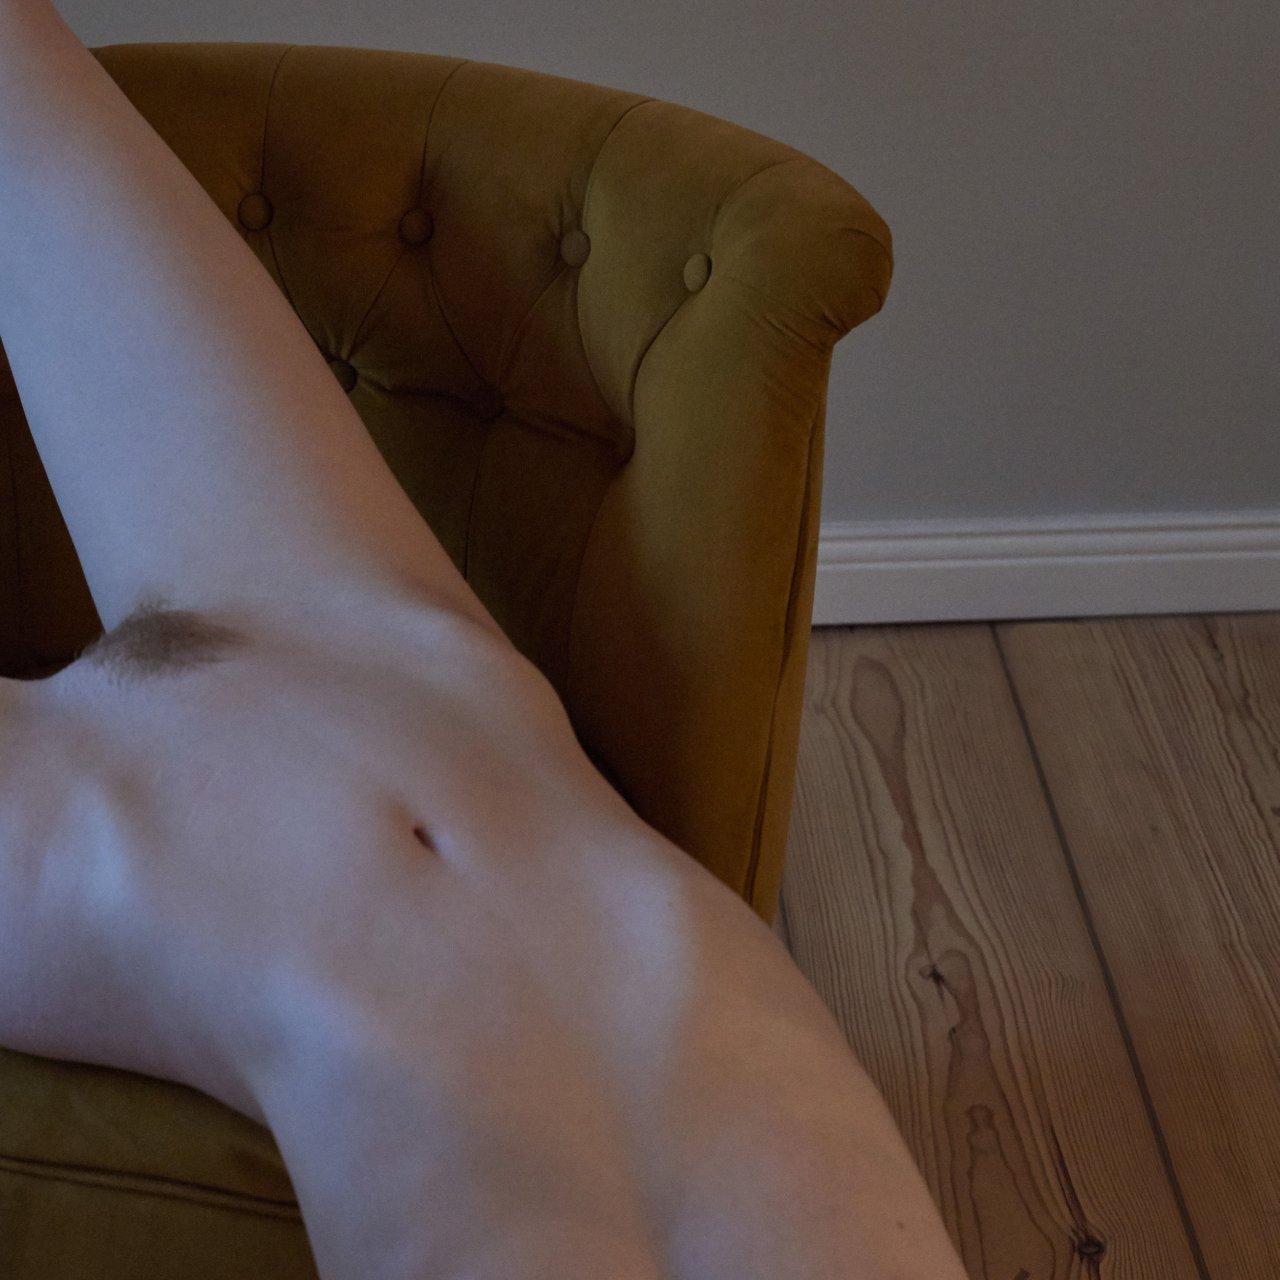 Janie long hair nude girls dildo play janie